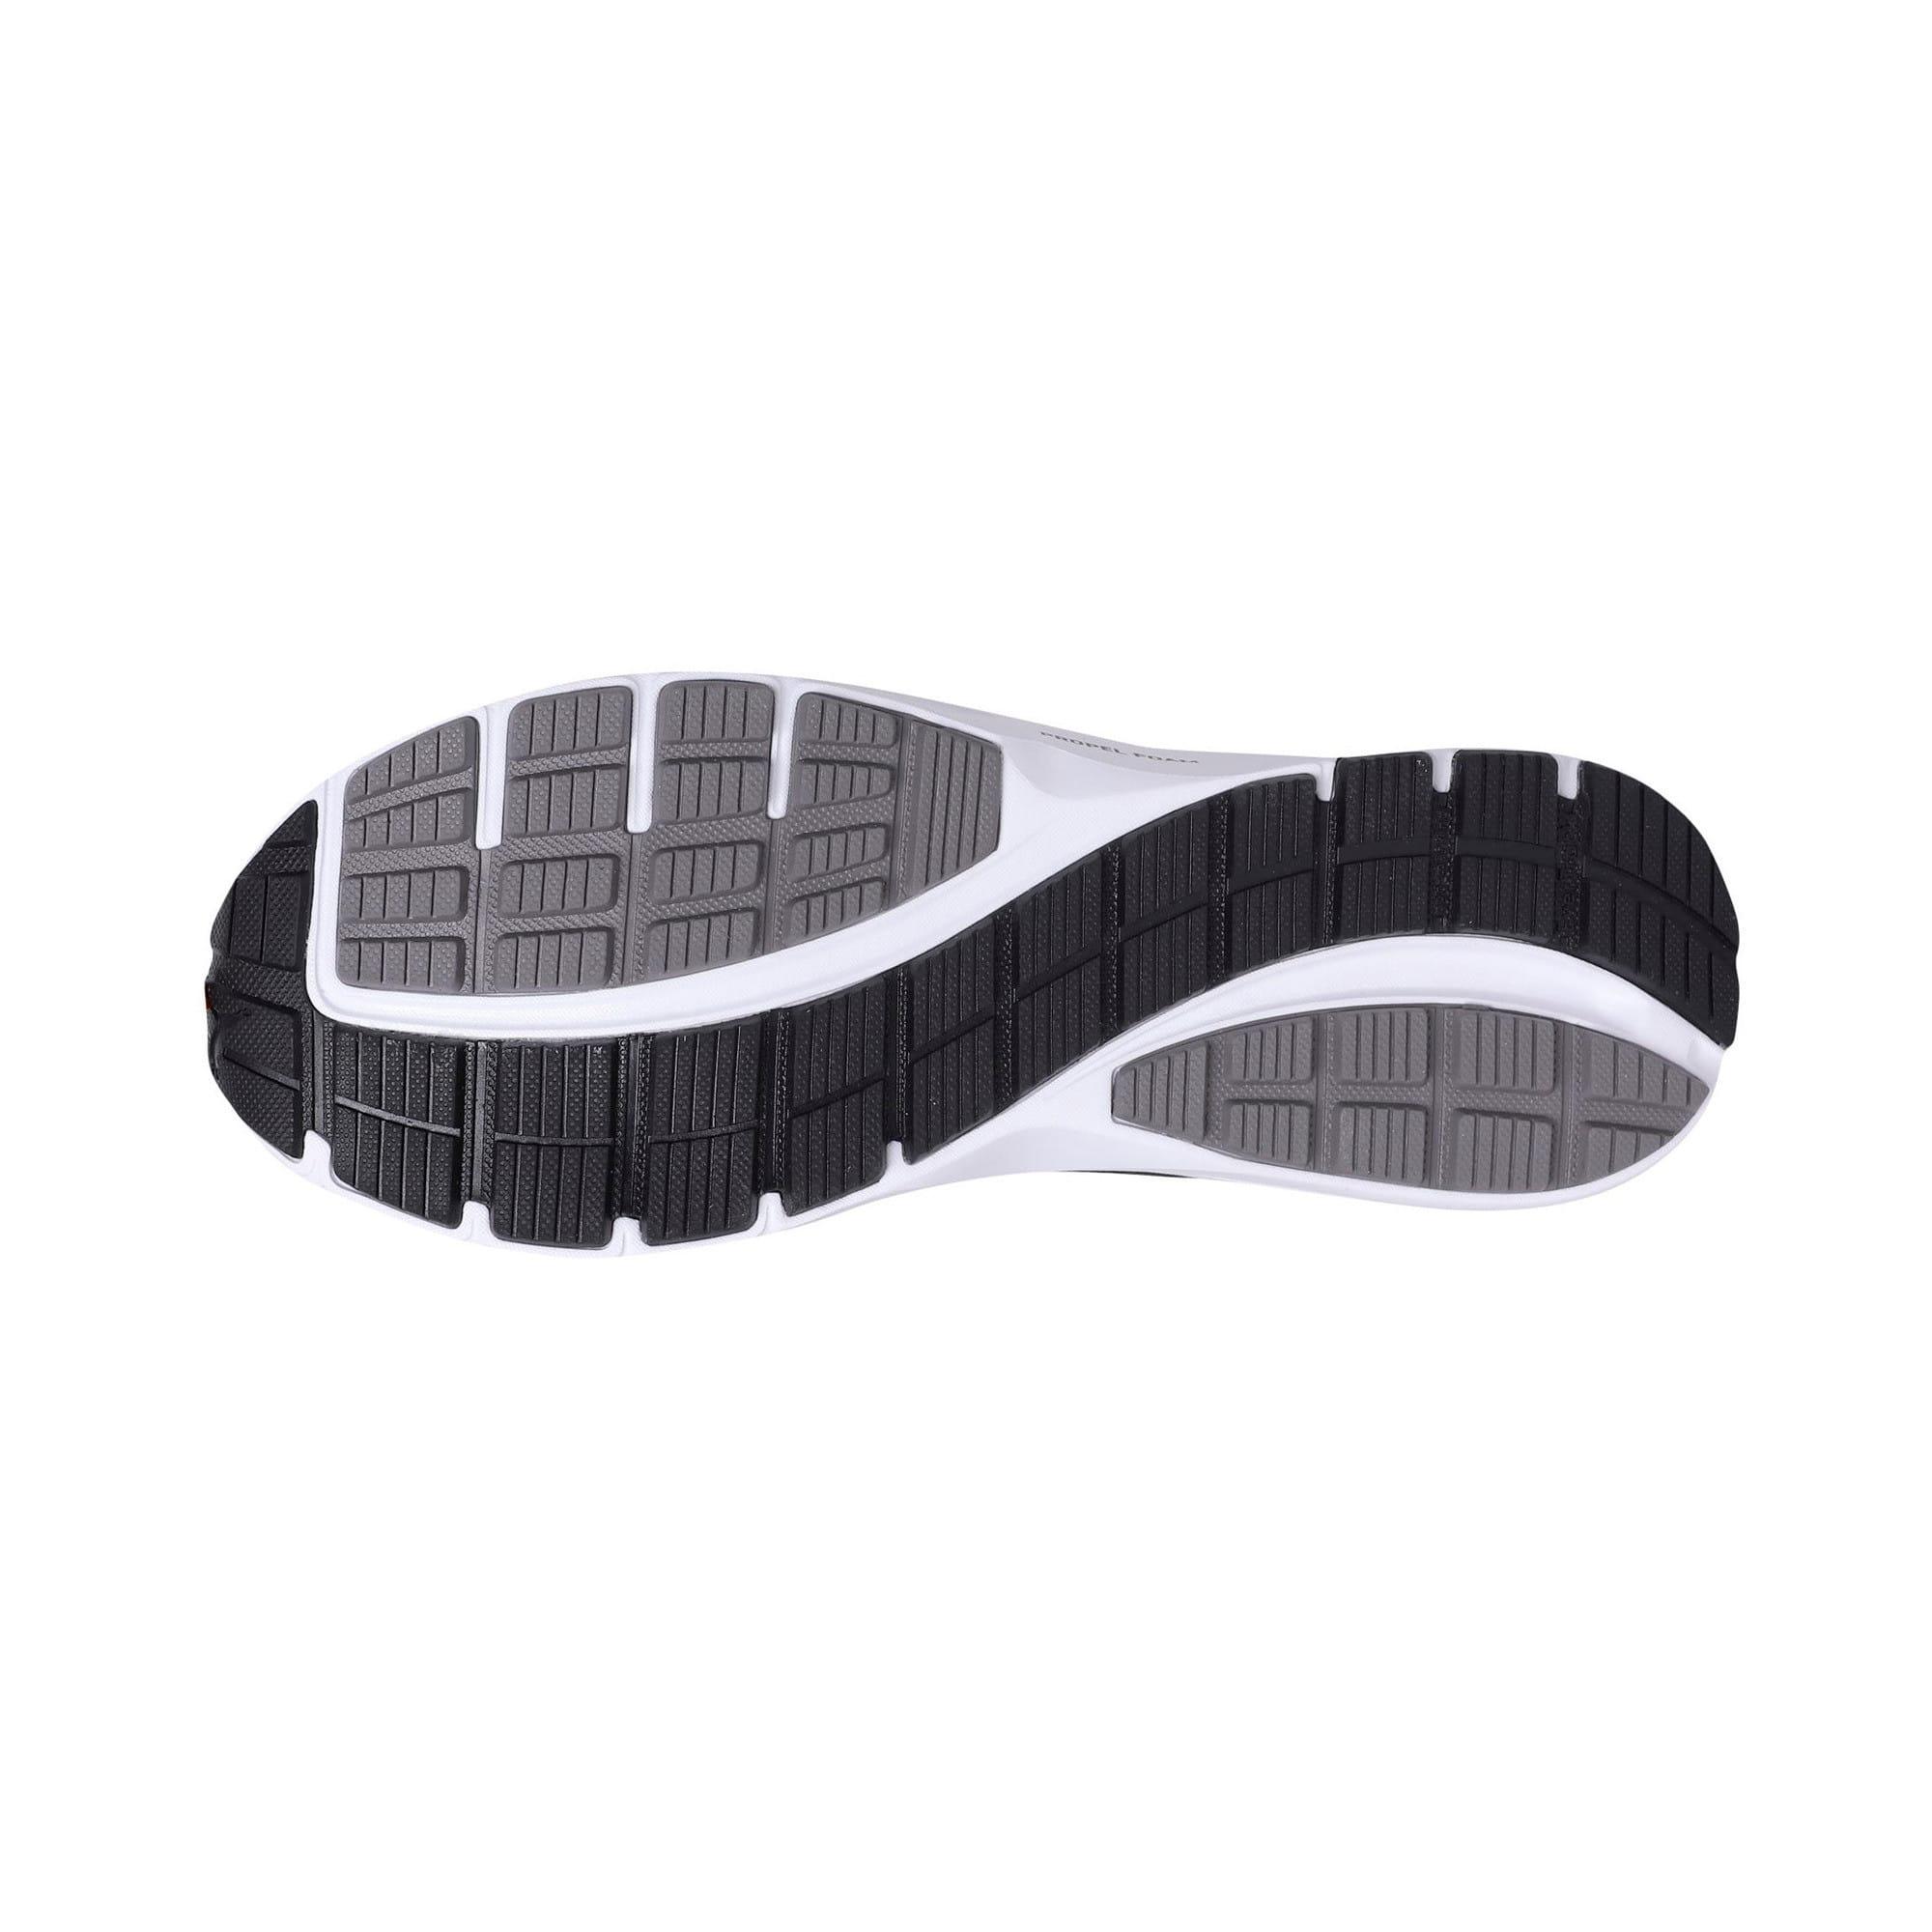 Thumbnail 4 of Essential Runner Men's Running Shoes, QUIET SHADE-Black-Silver, medium-IND